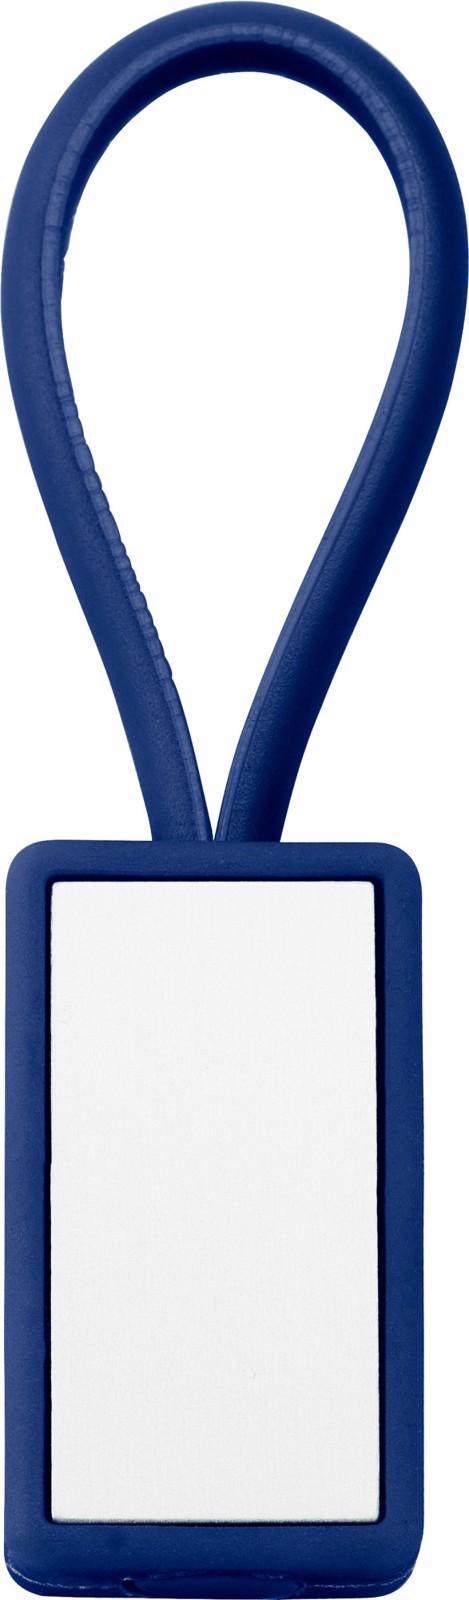 Plastic key holder - Blue